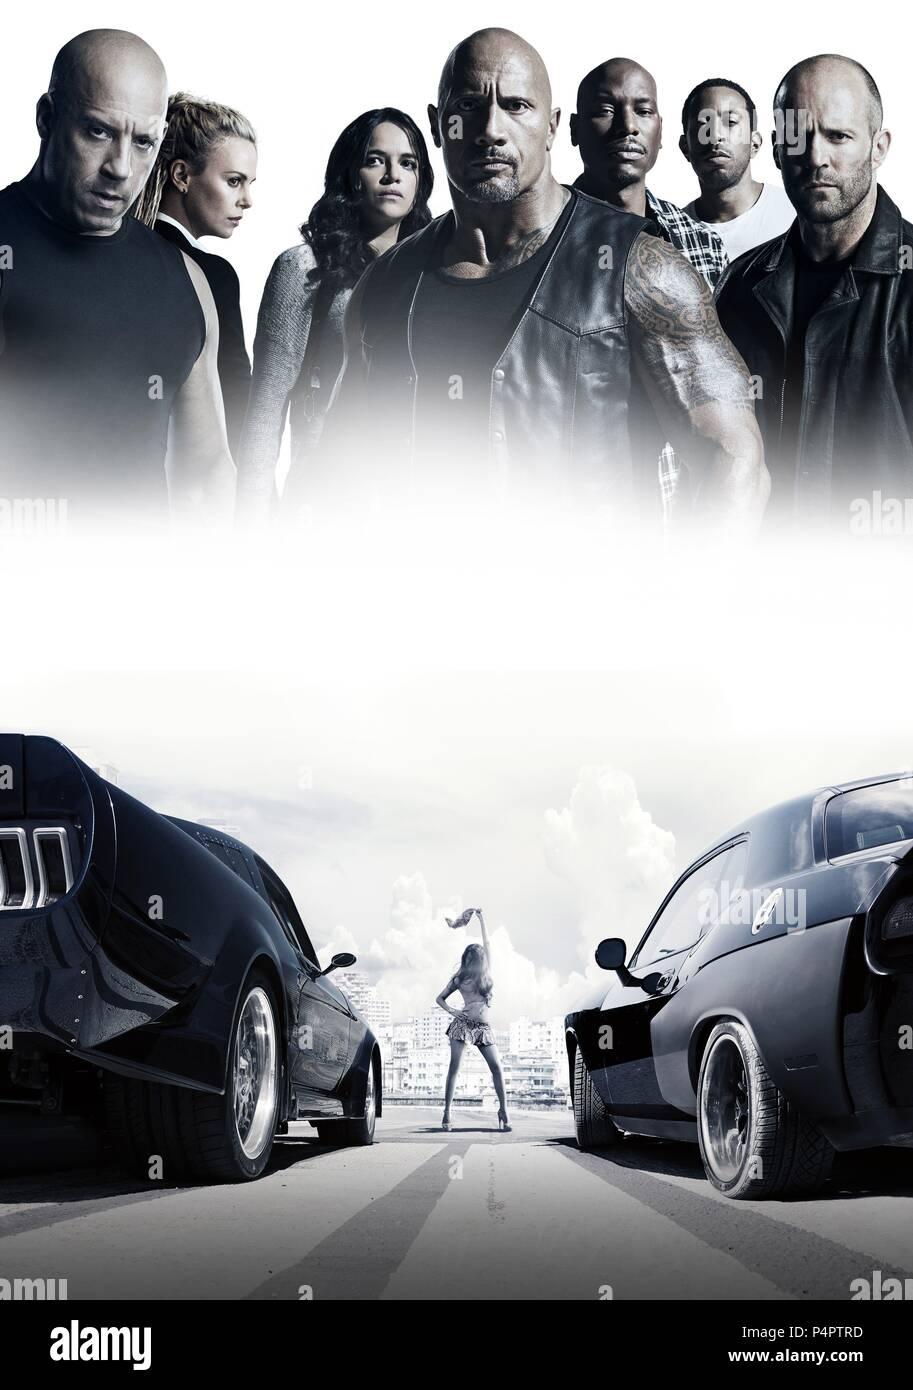 Original Film Titel Fast Furious 8 Englischer Titel Fast